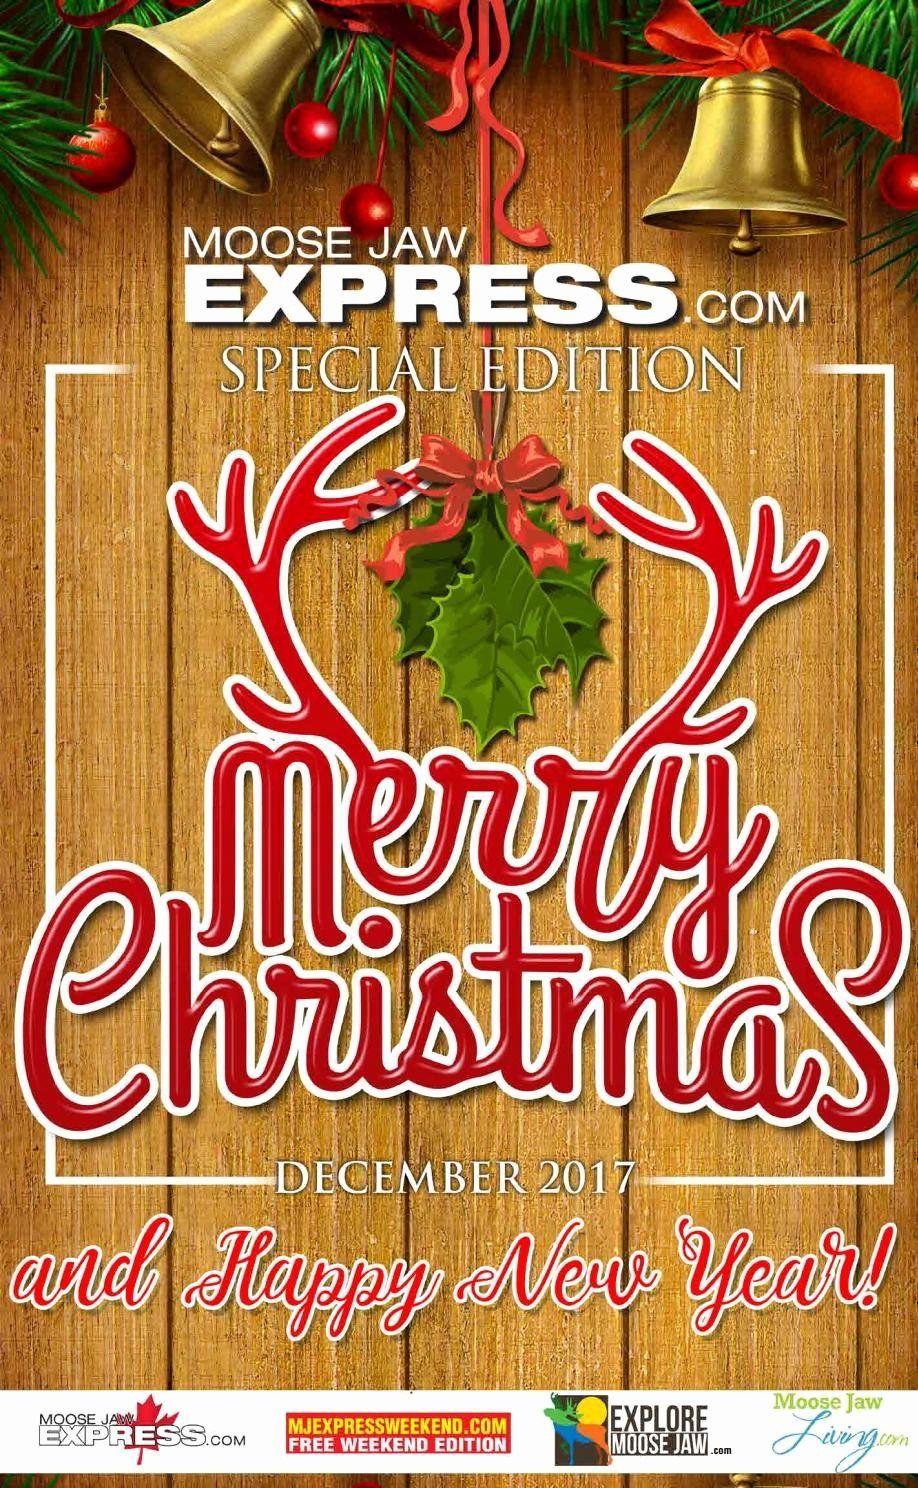 Silent Night Christmas Card Luxury Christmas 2017 By Moose Jaw Express Issuu Silent Night Christmas Card Christmas Card Template Christmas Cards